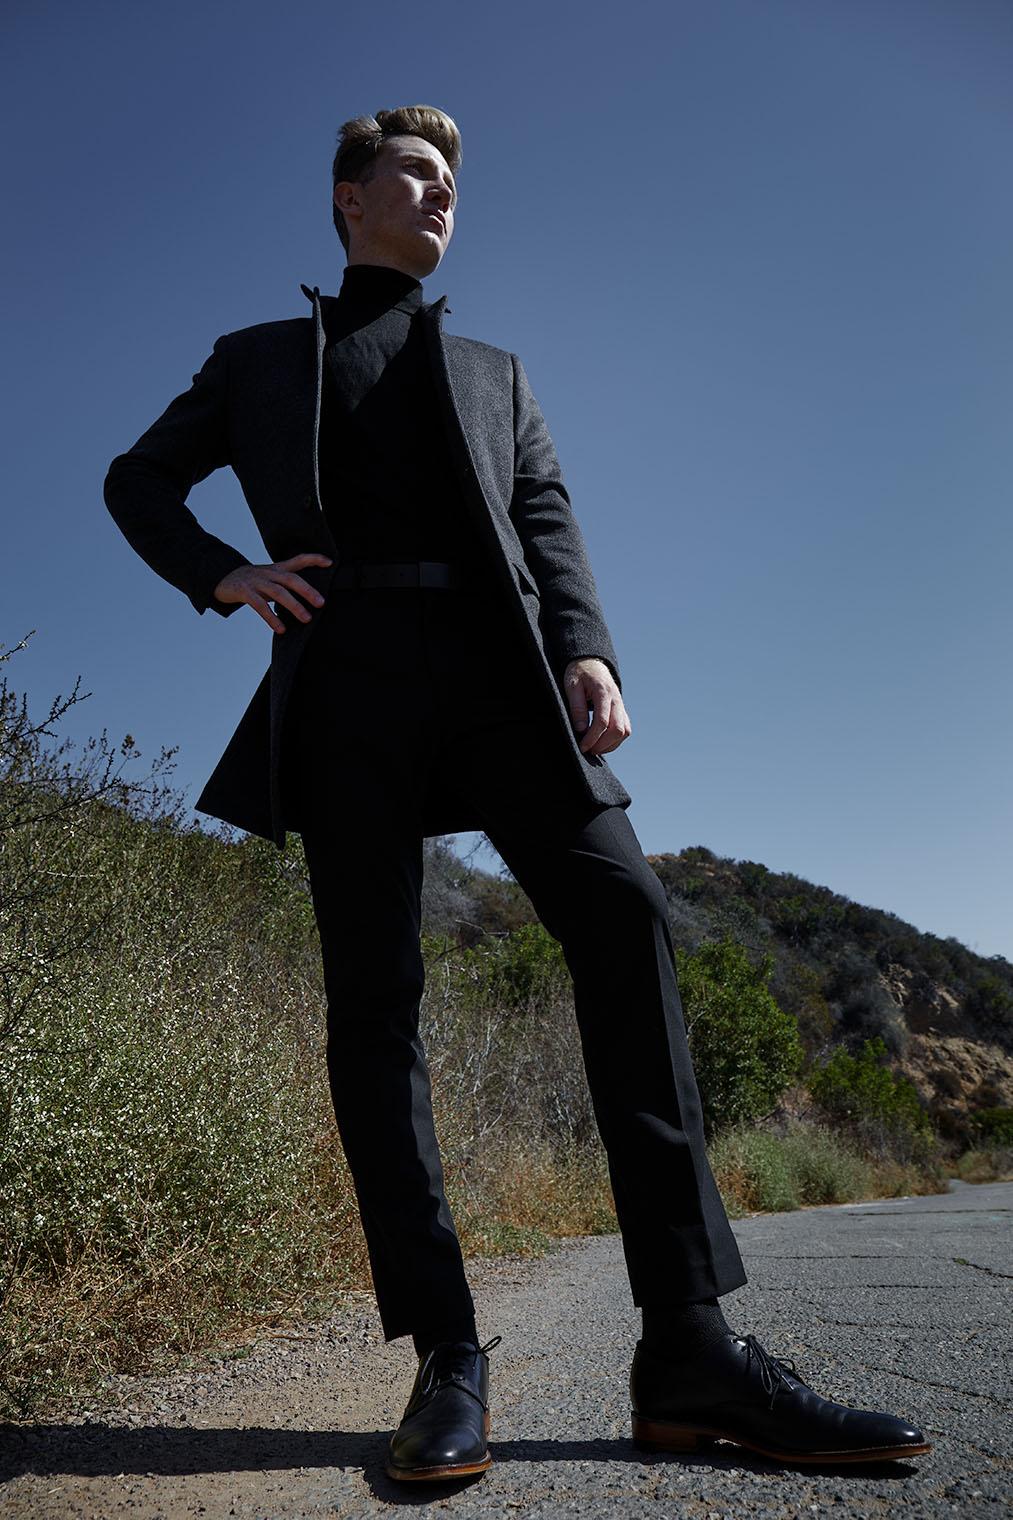 mens fashion - male fashion photography Los Angeles